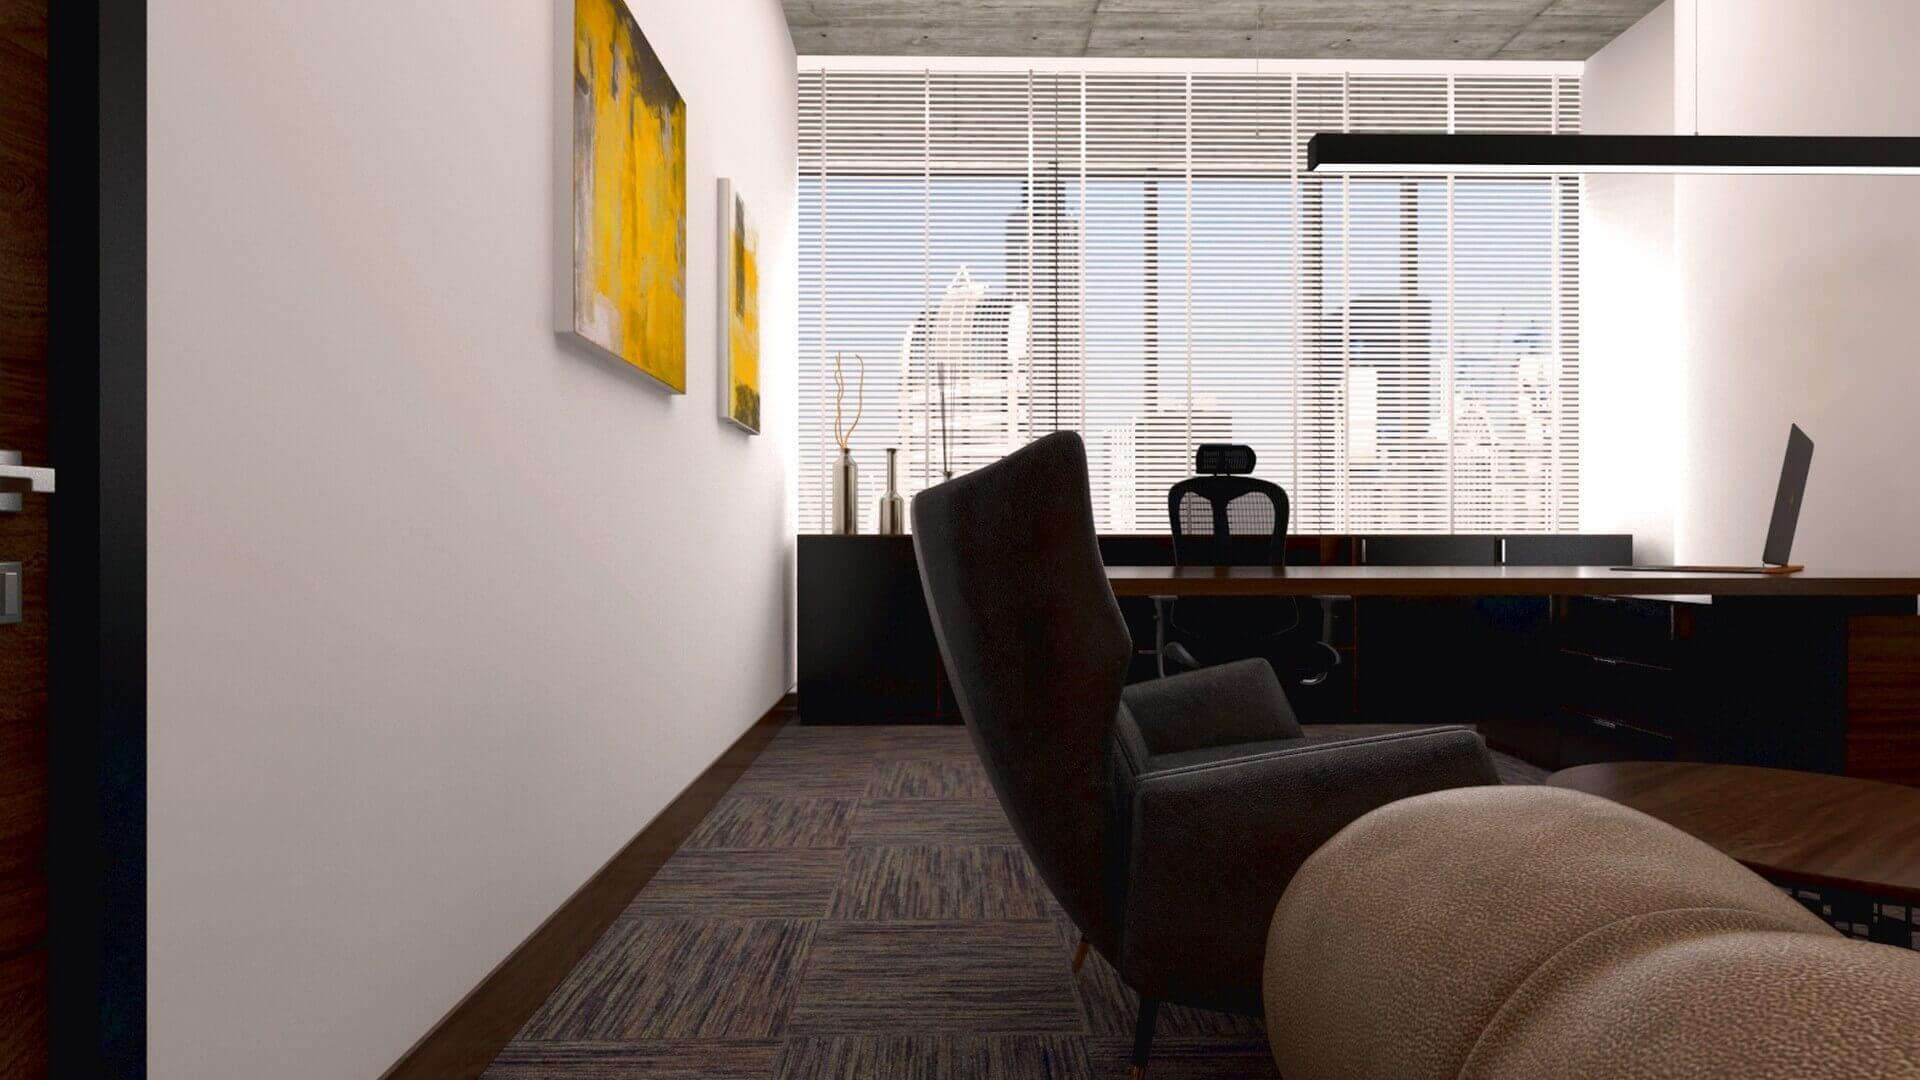 Besa Kule 2609 Kebo Ofis Ofisler